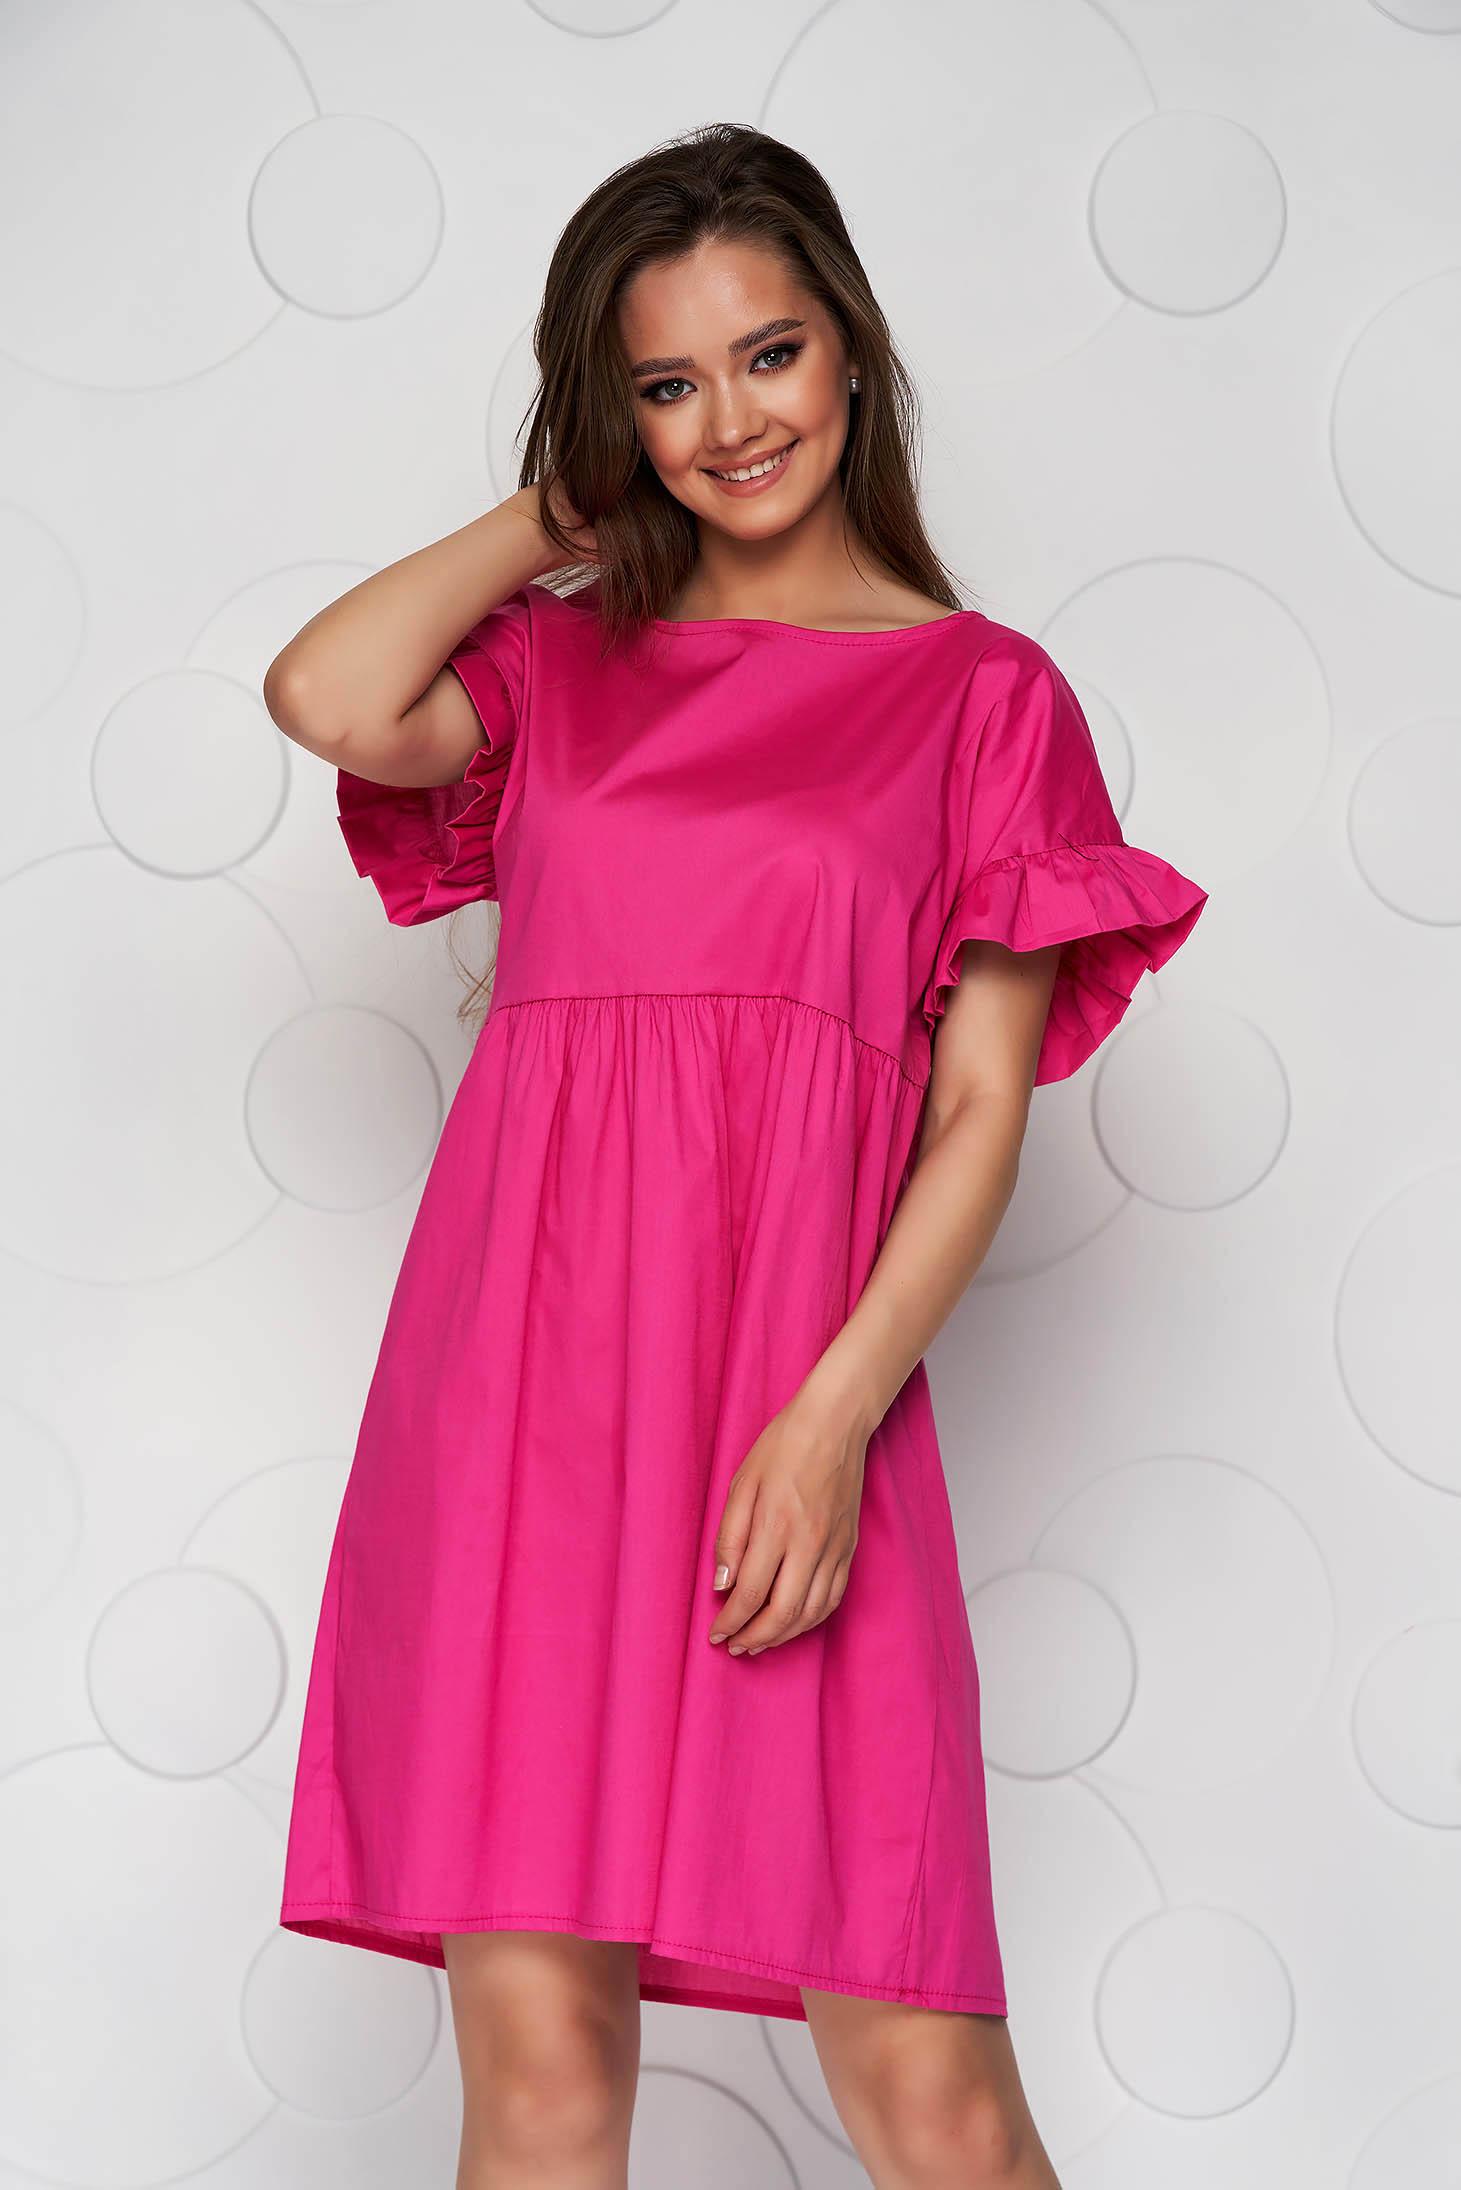 Rochie roz din poplin cu croi larg cu volanase